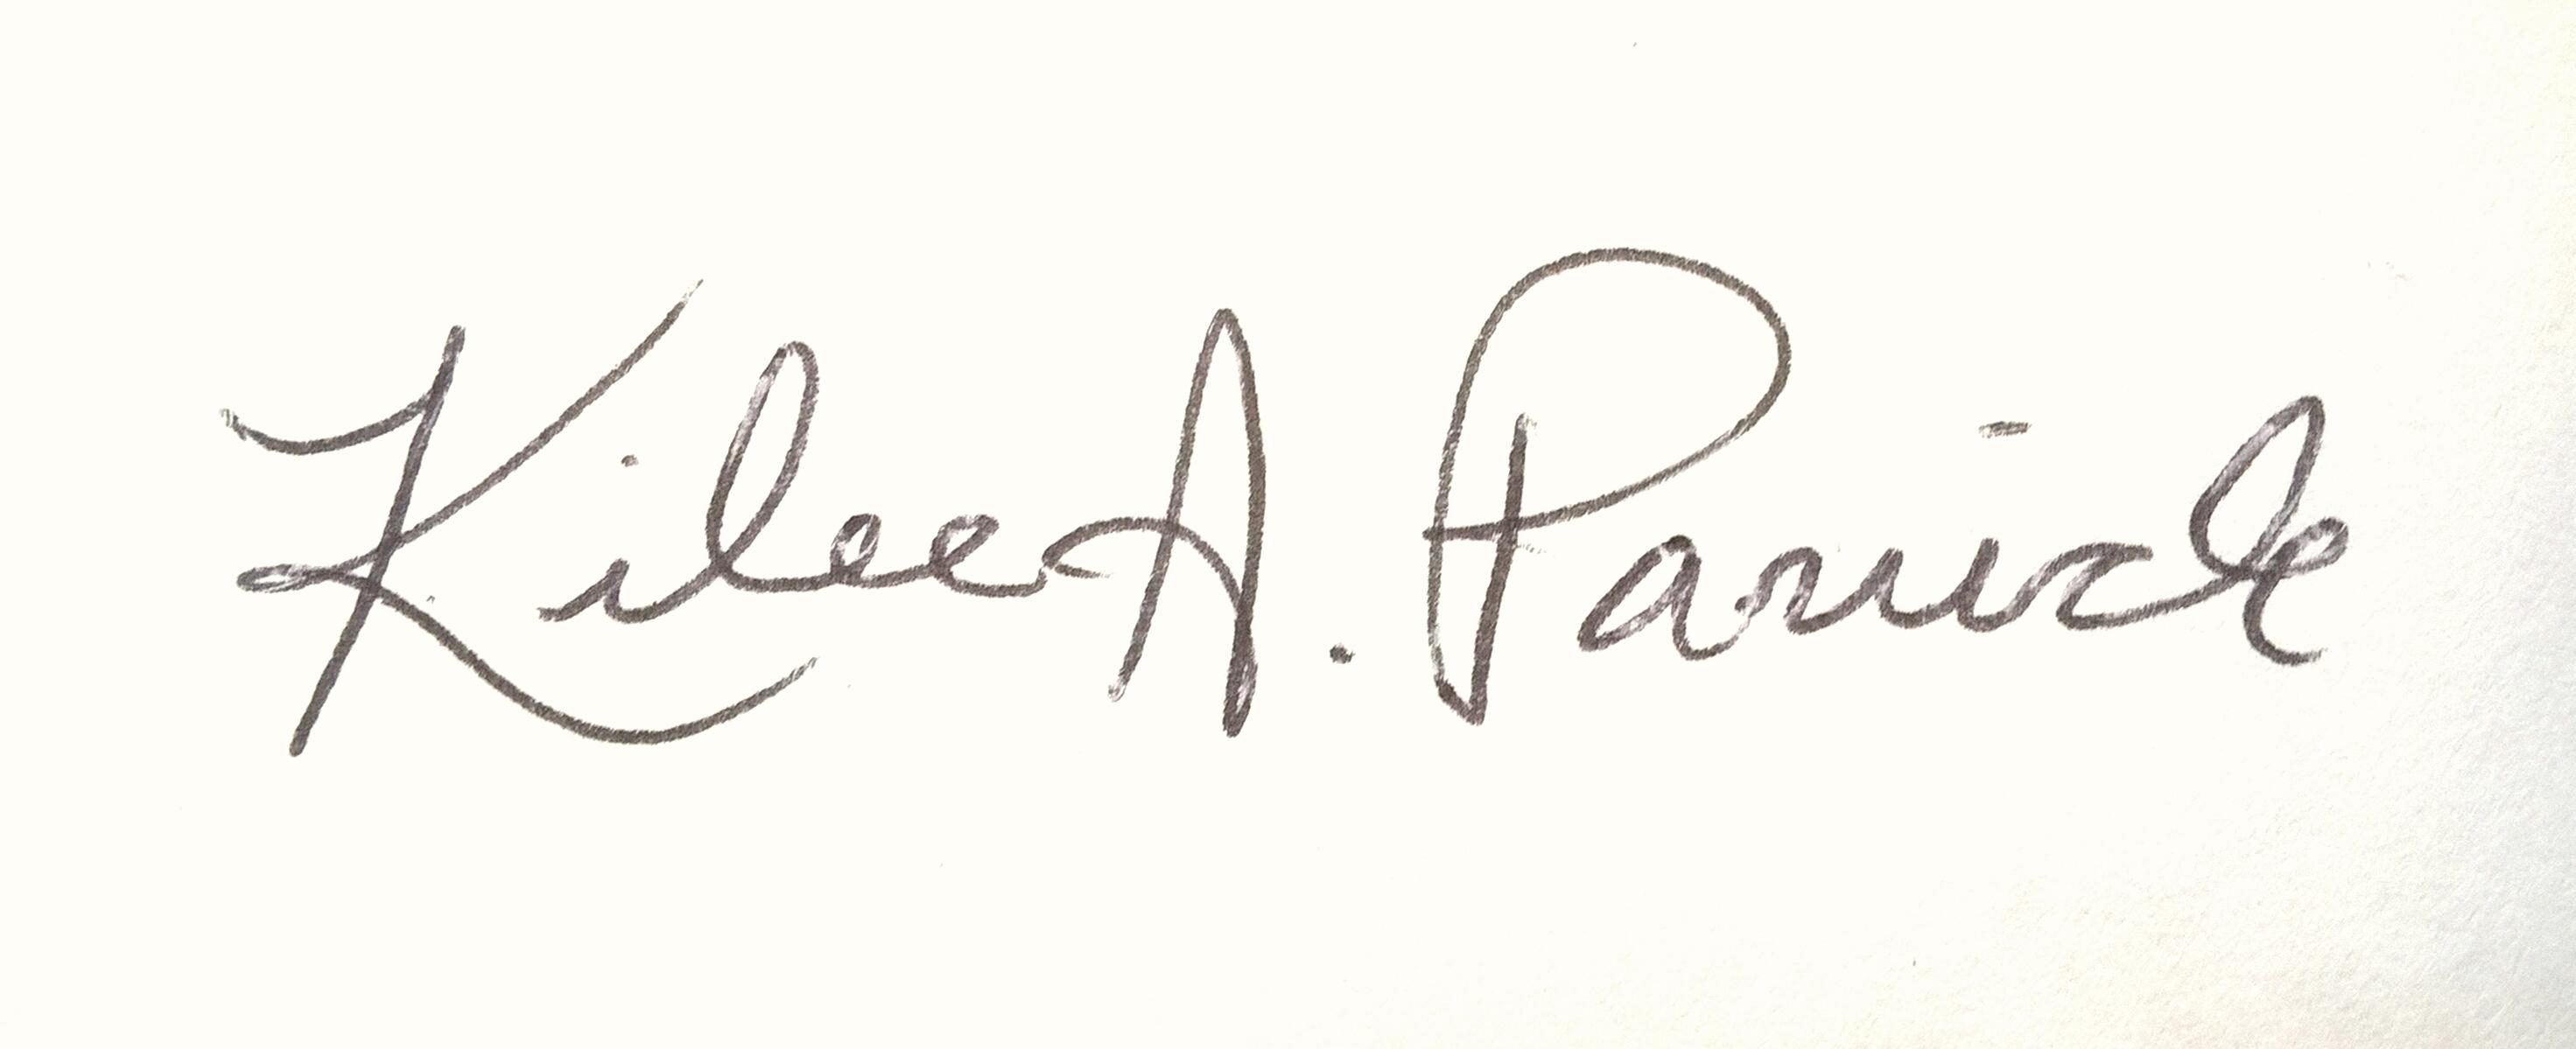 Kilee Panick Signature